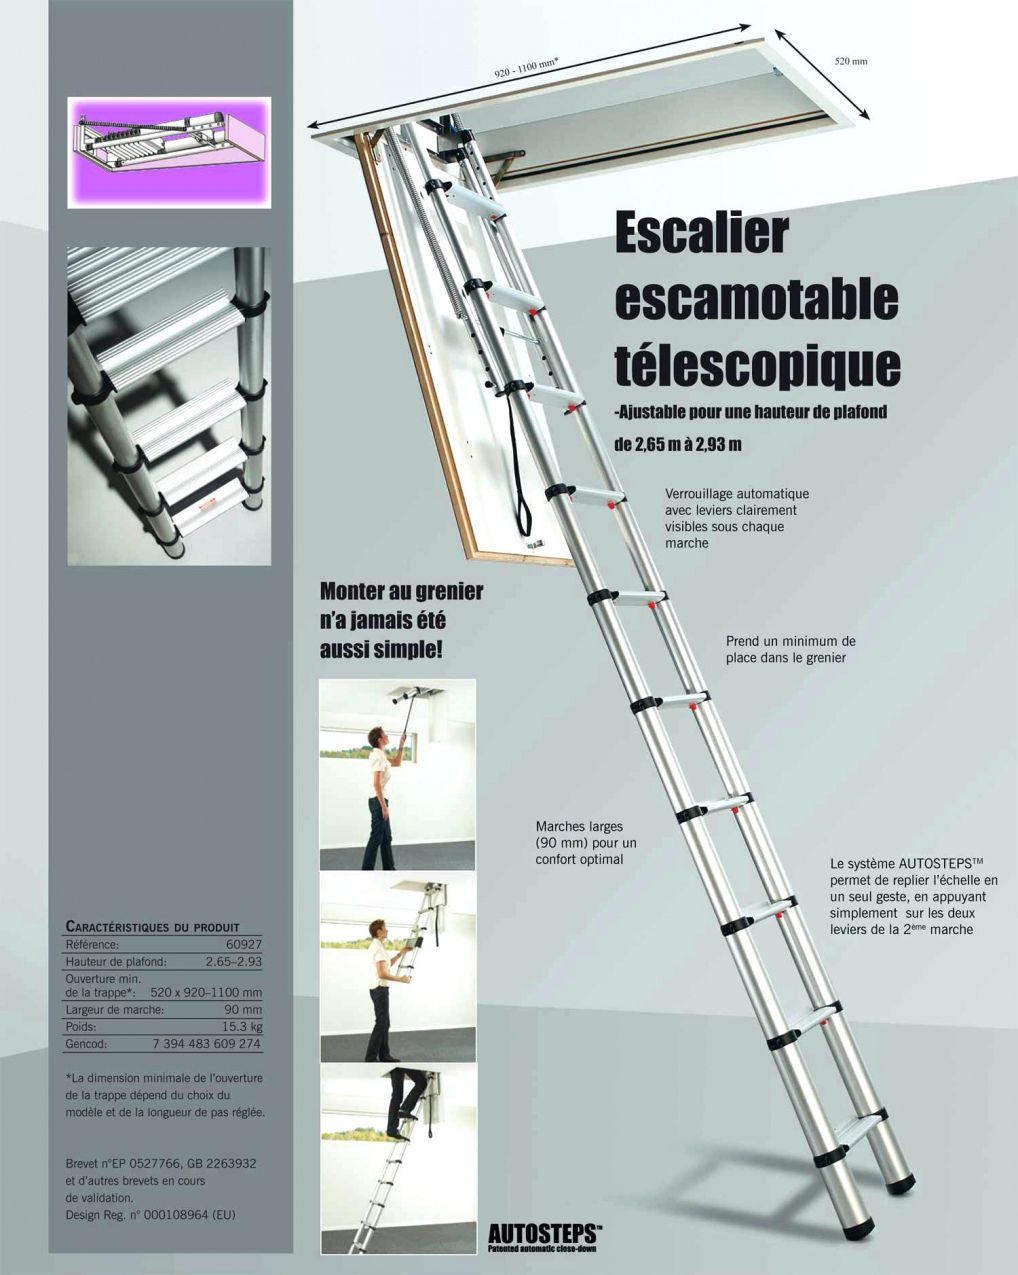 50 Echelle De Meunier Brico Depot 2018 Echelle De Grenier Echelle Telescopique Echelle